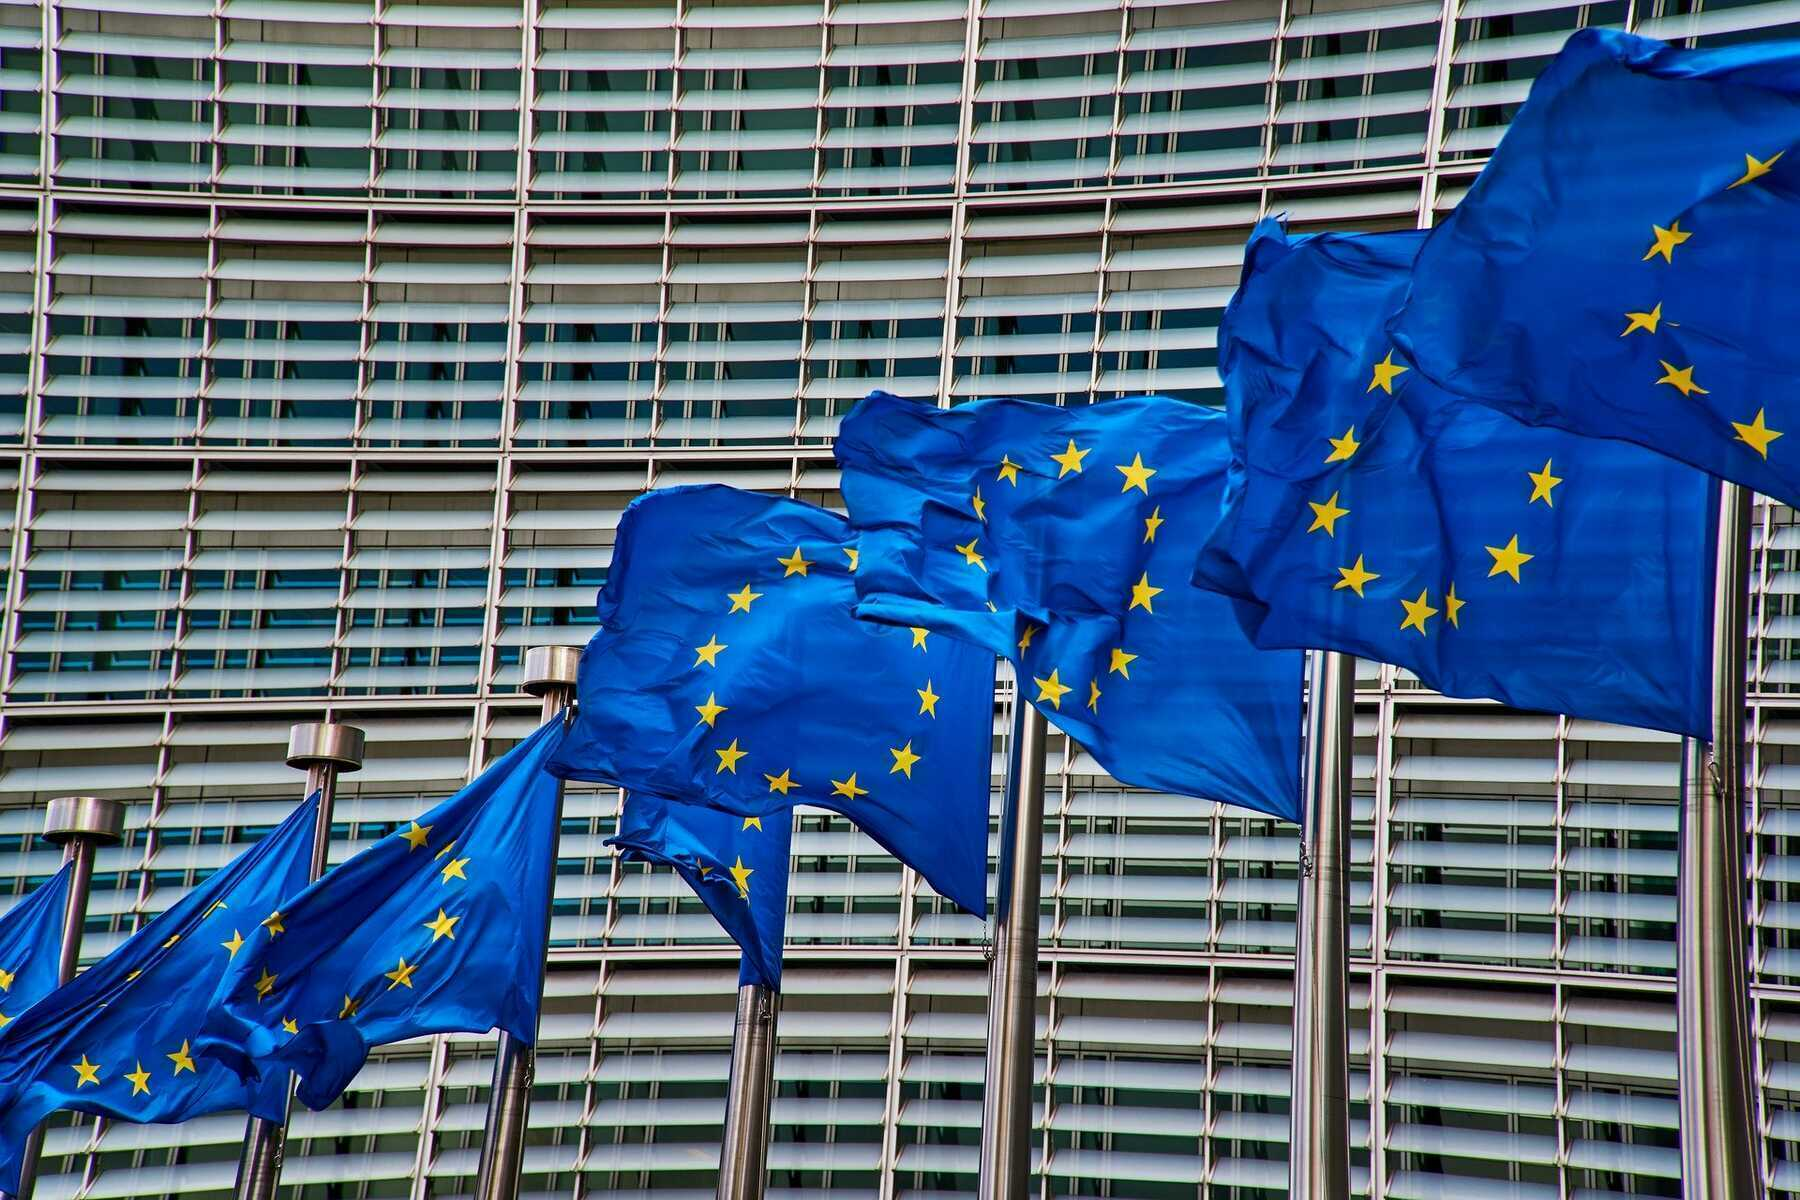 Sterke Europese sociale dialoog noodzakelijk in herstelplan Europese Unie